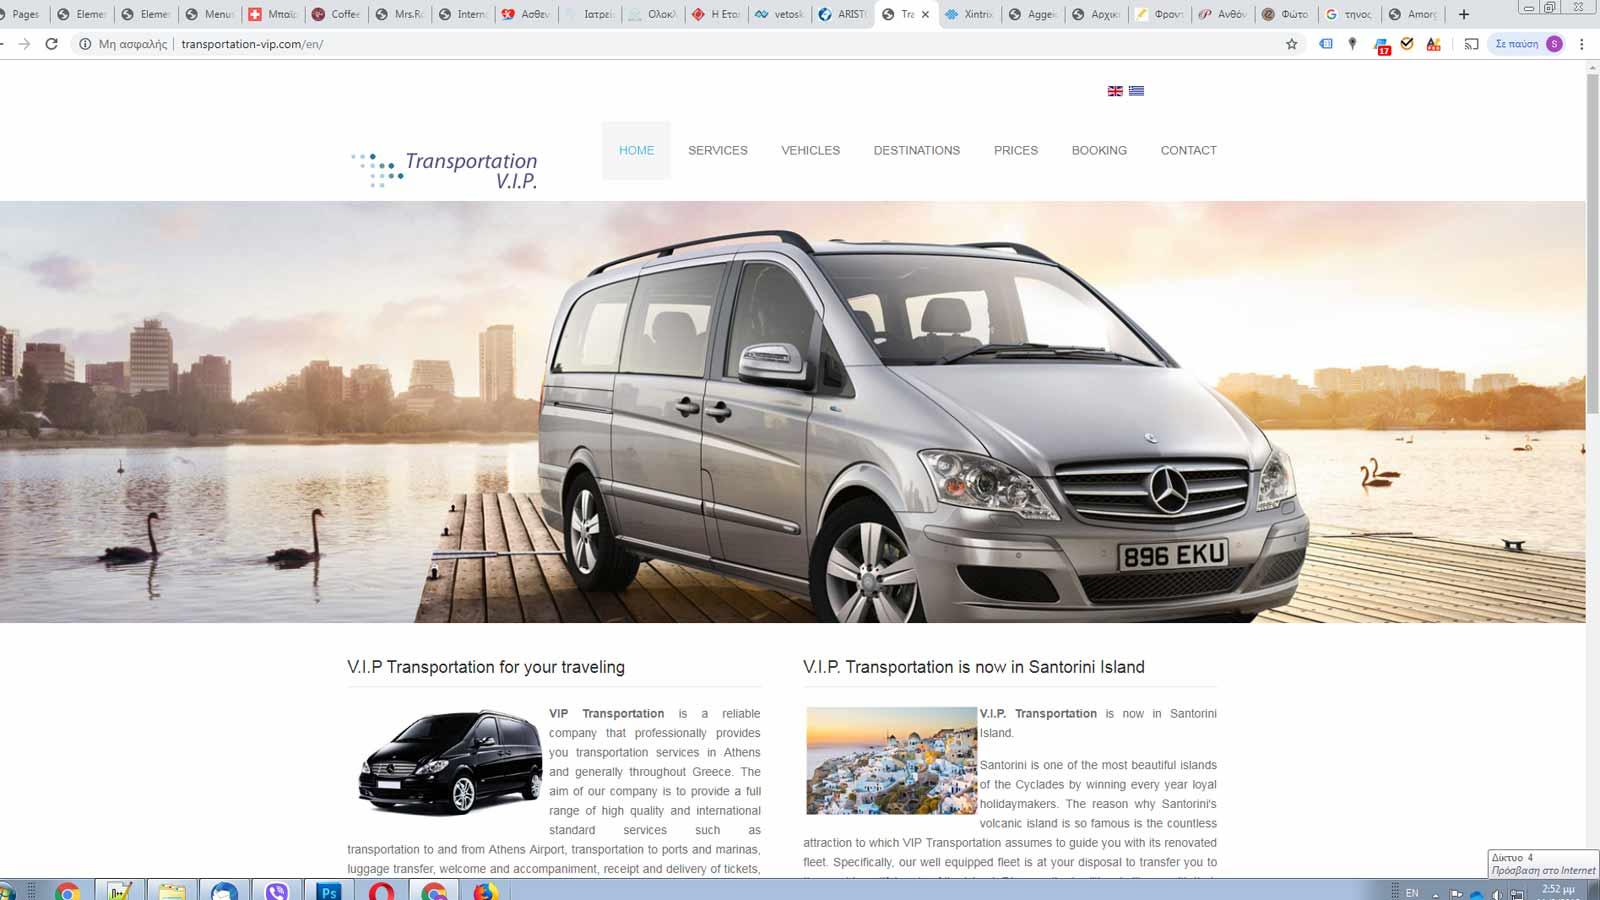 transportation-vip.com